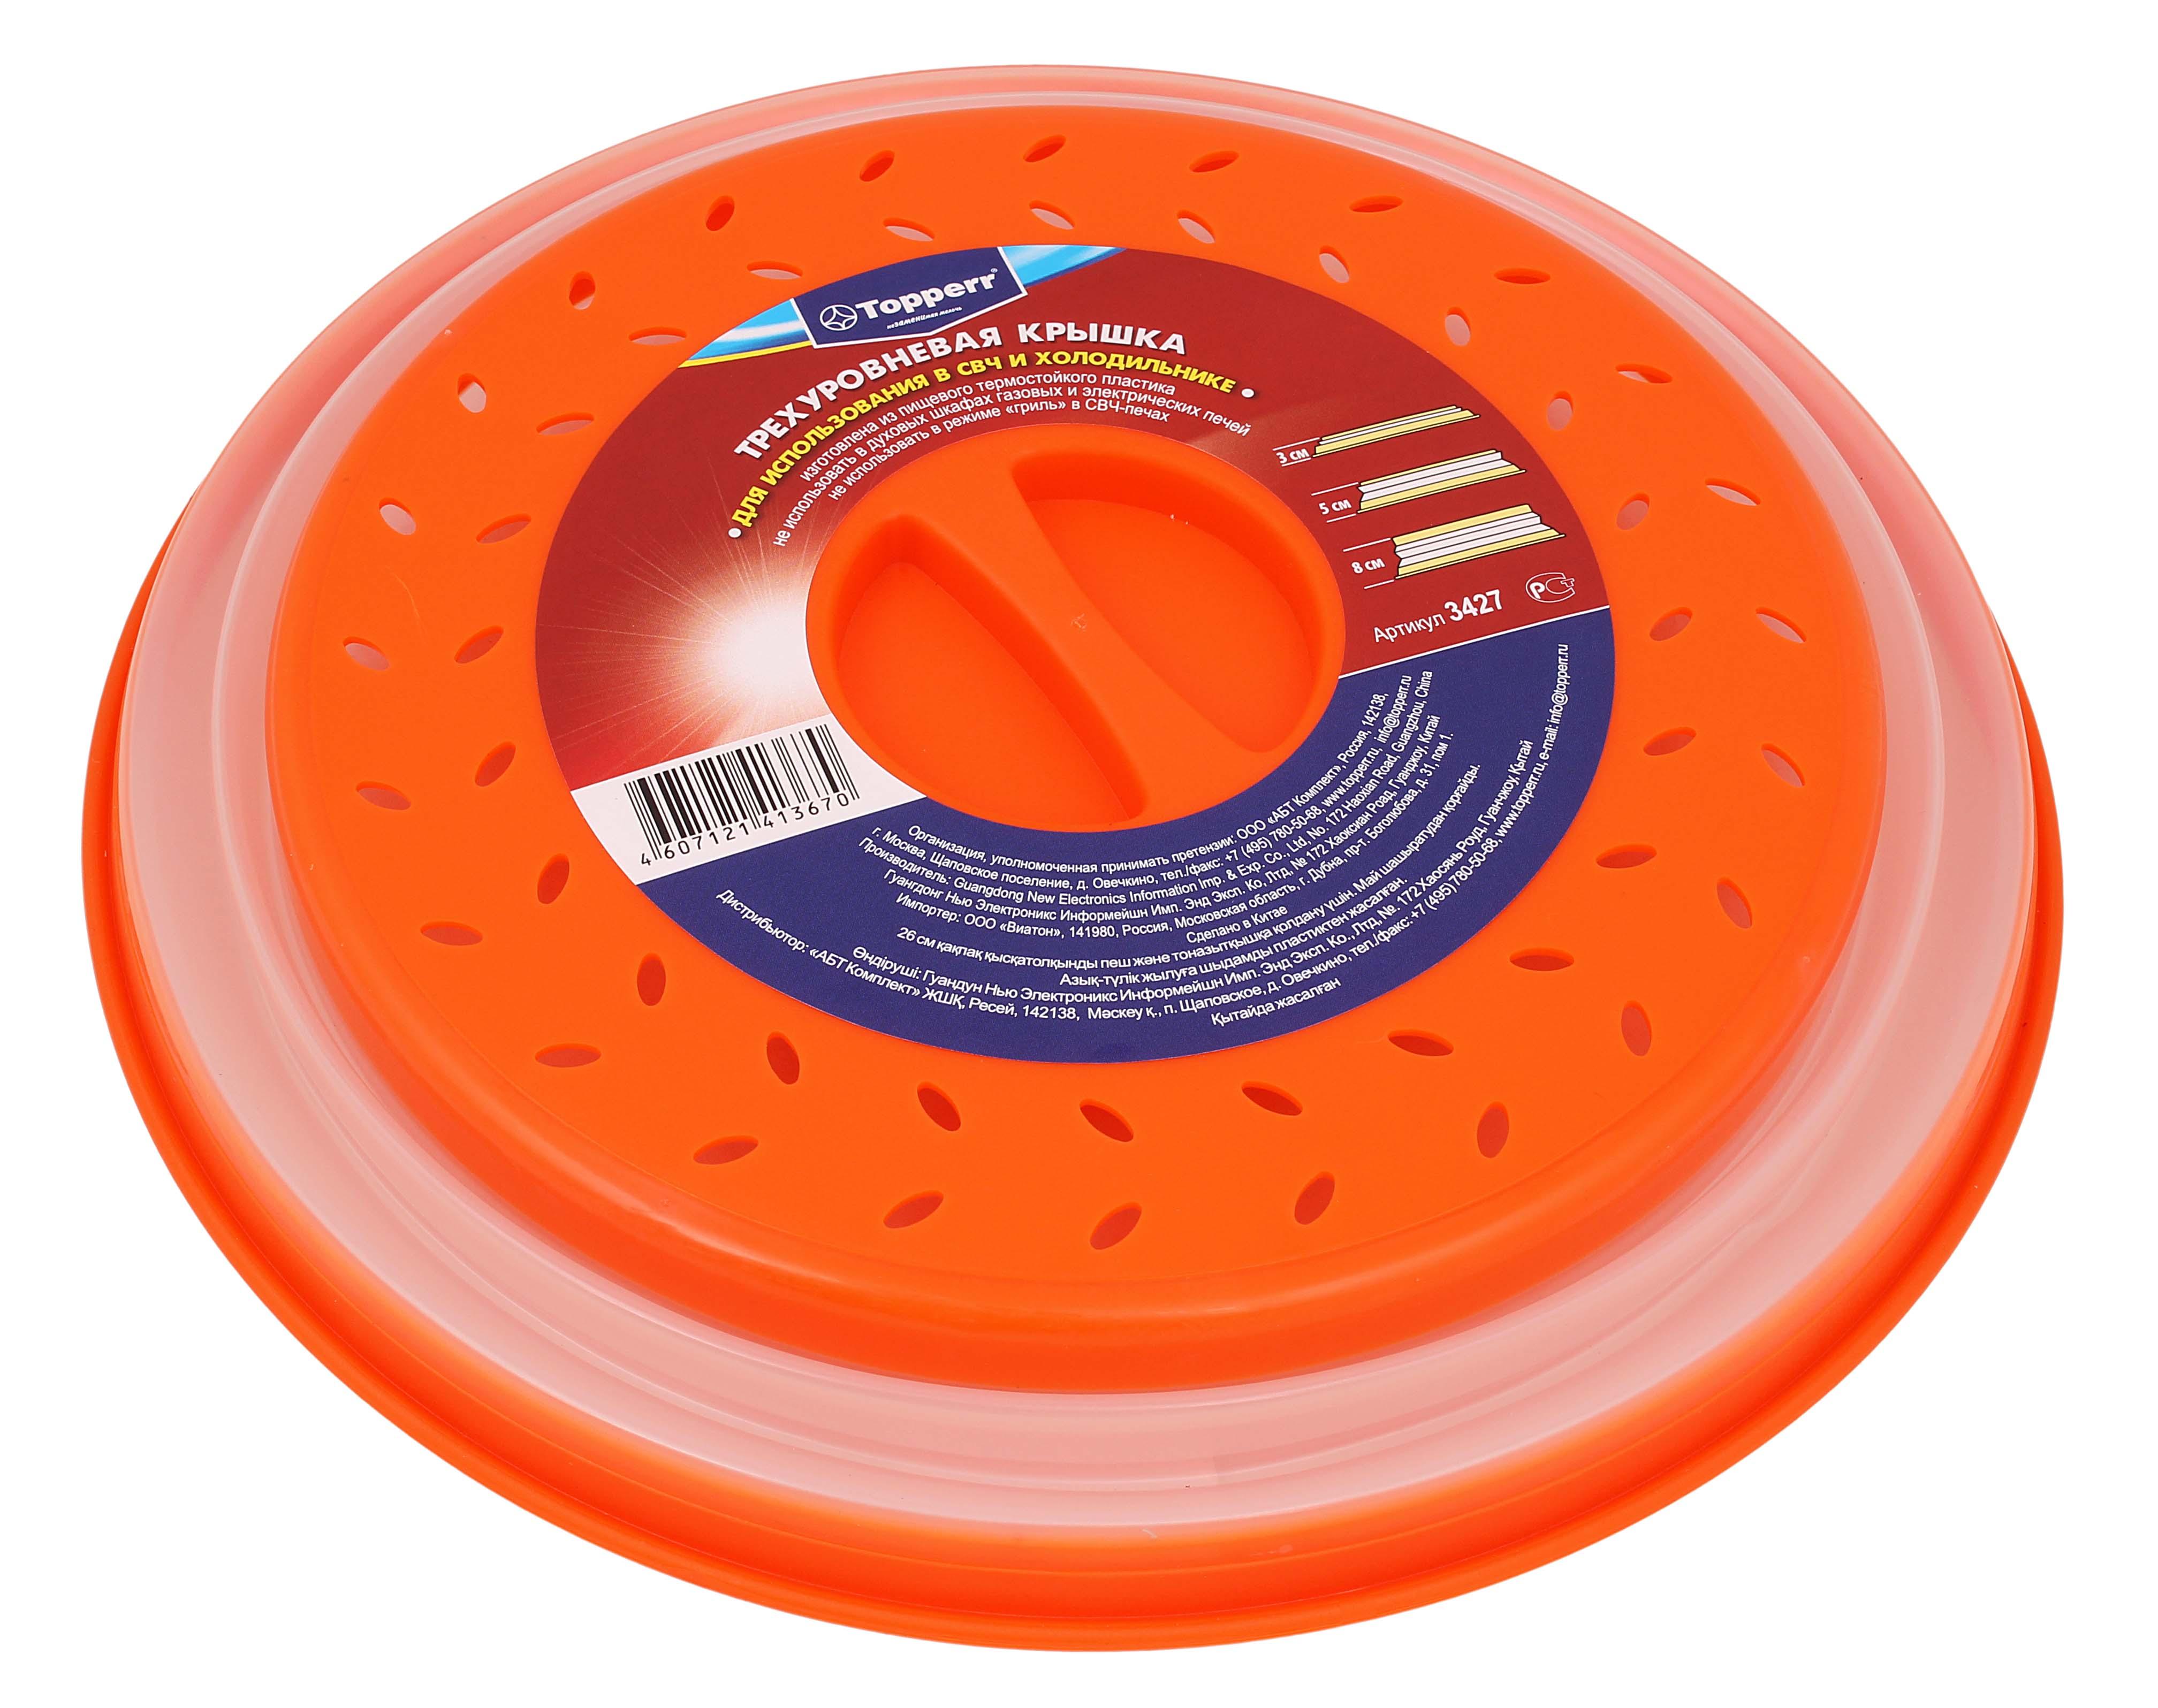 Пластиковая посуда для СВЧ Topperr Real Brand Technics 189.000